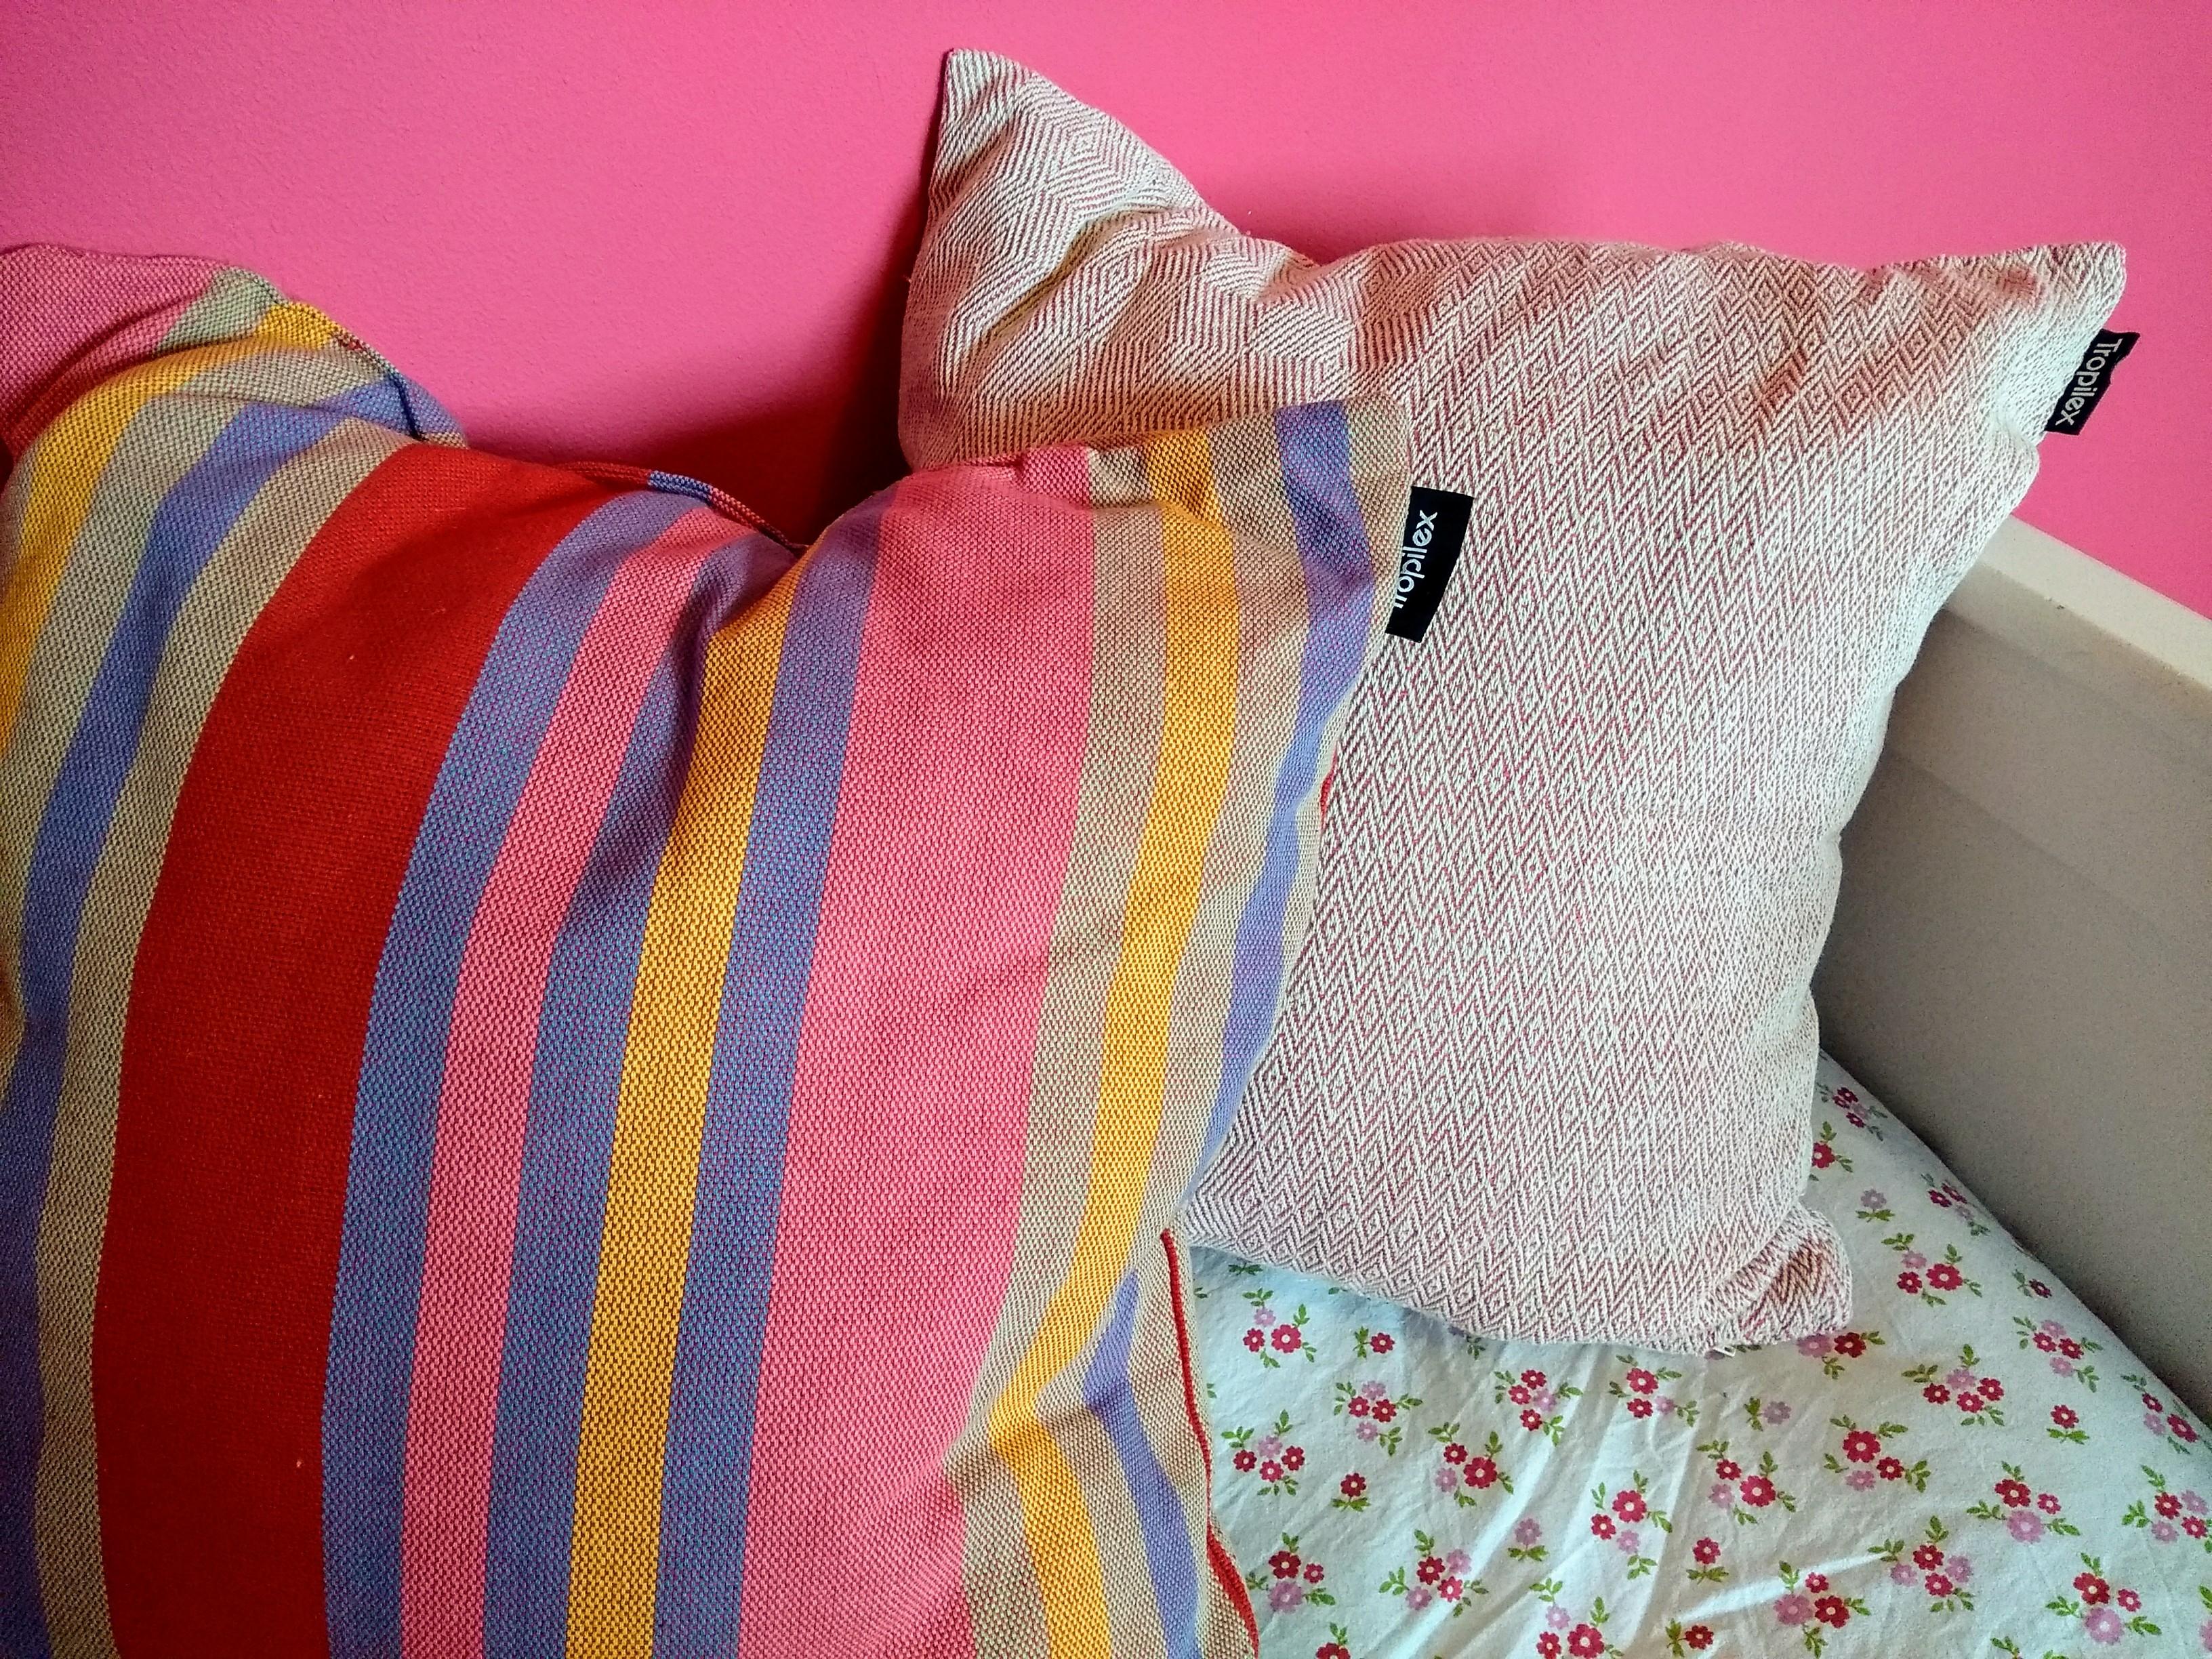 interieur, kinderkamer, tropilex, kussens, kinderkamers, nieuwe kamers, klussen, verbouwen, mamablog, mamalifestyle, lalog.nl